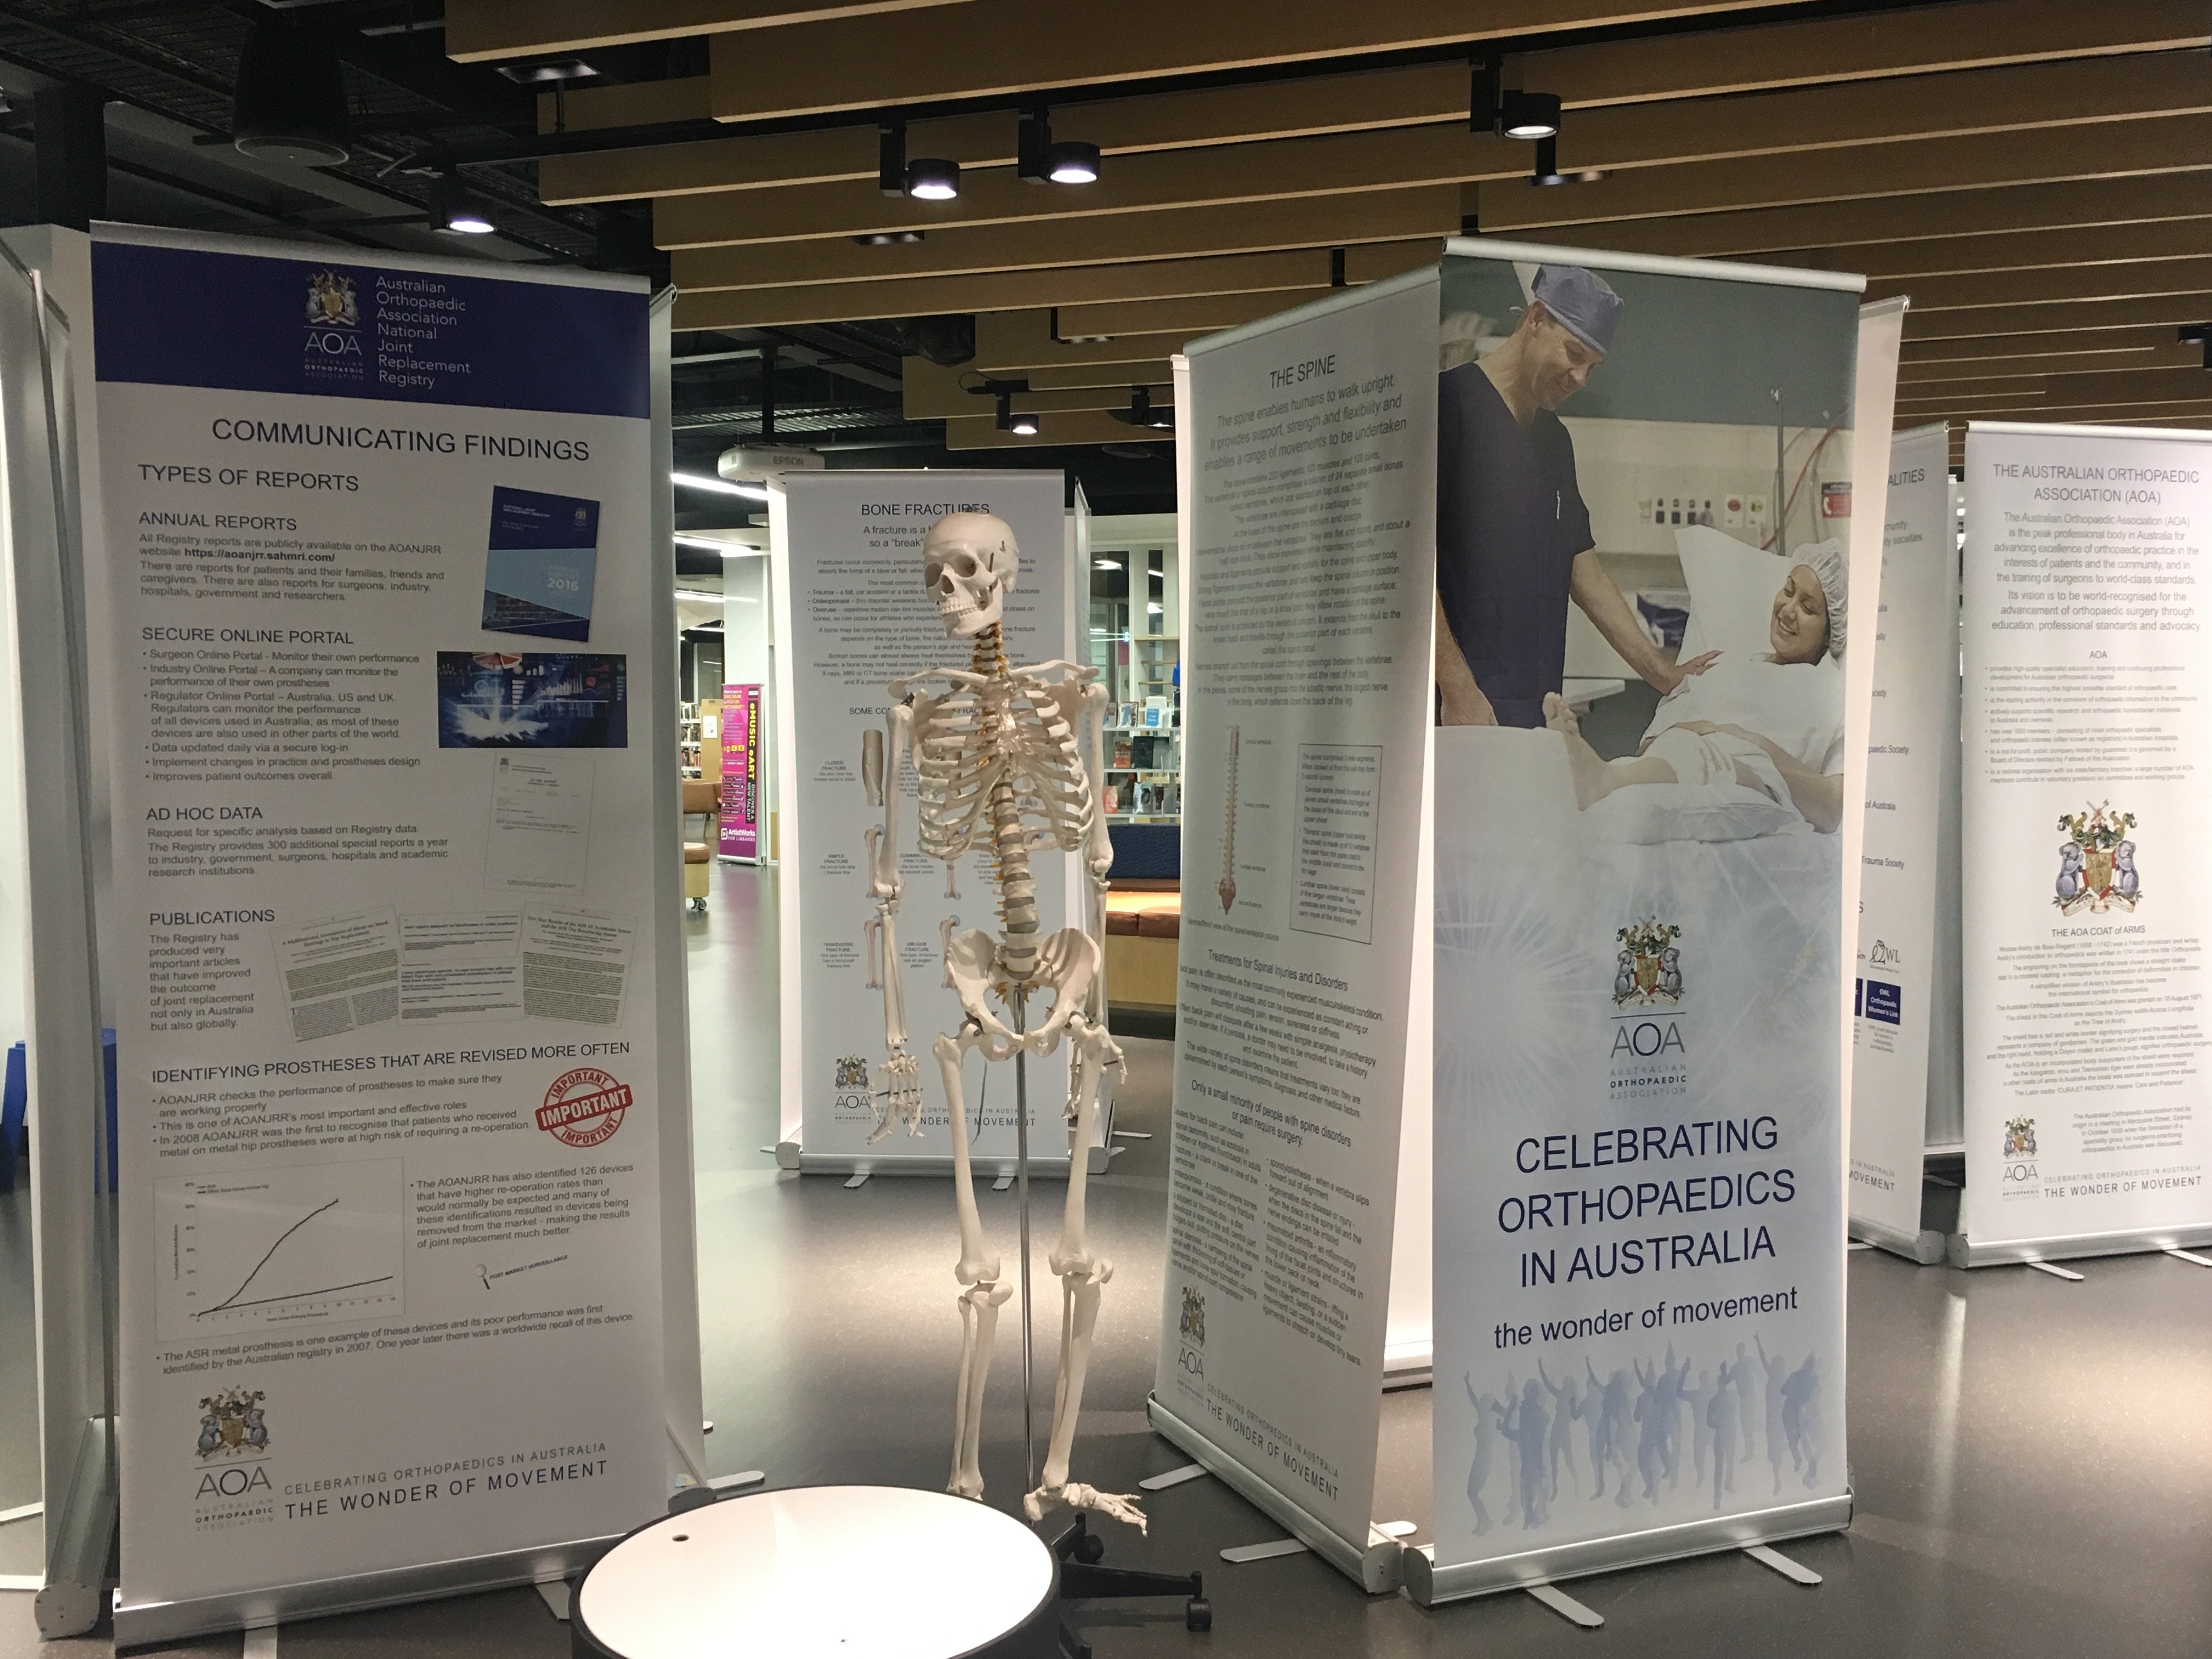 Travelling Exhibition - AOA | Australian Orthopaedic Association